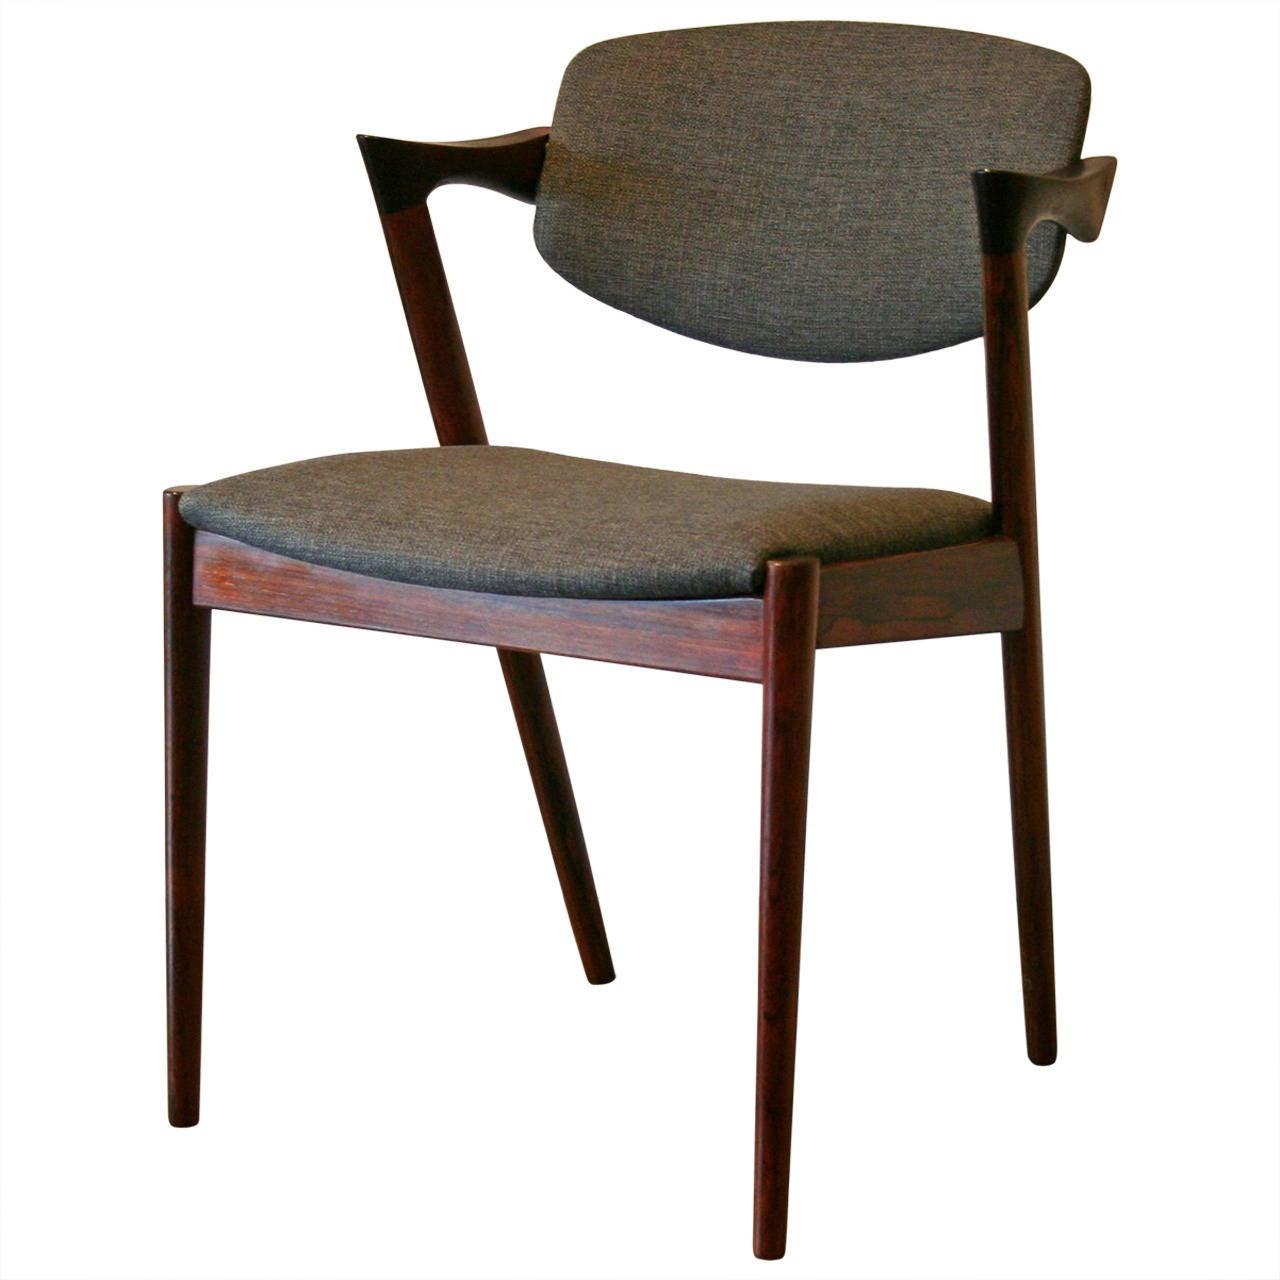 Danish rosewood dining chairs by kai kristiansen at 1stdibs - Kai kristiansen chair ...